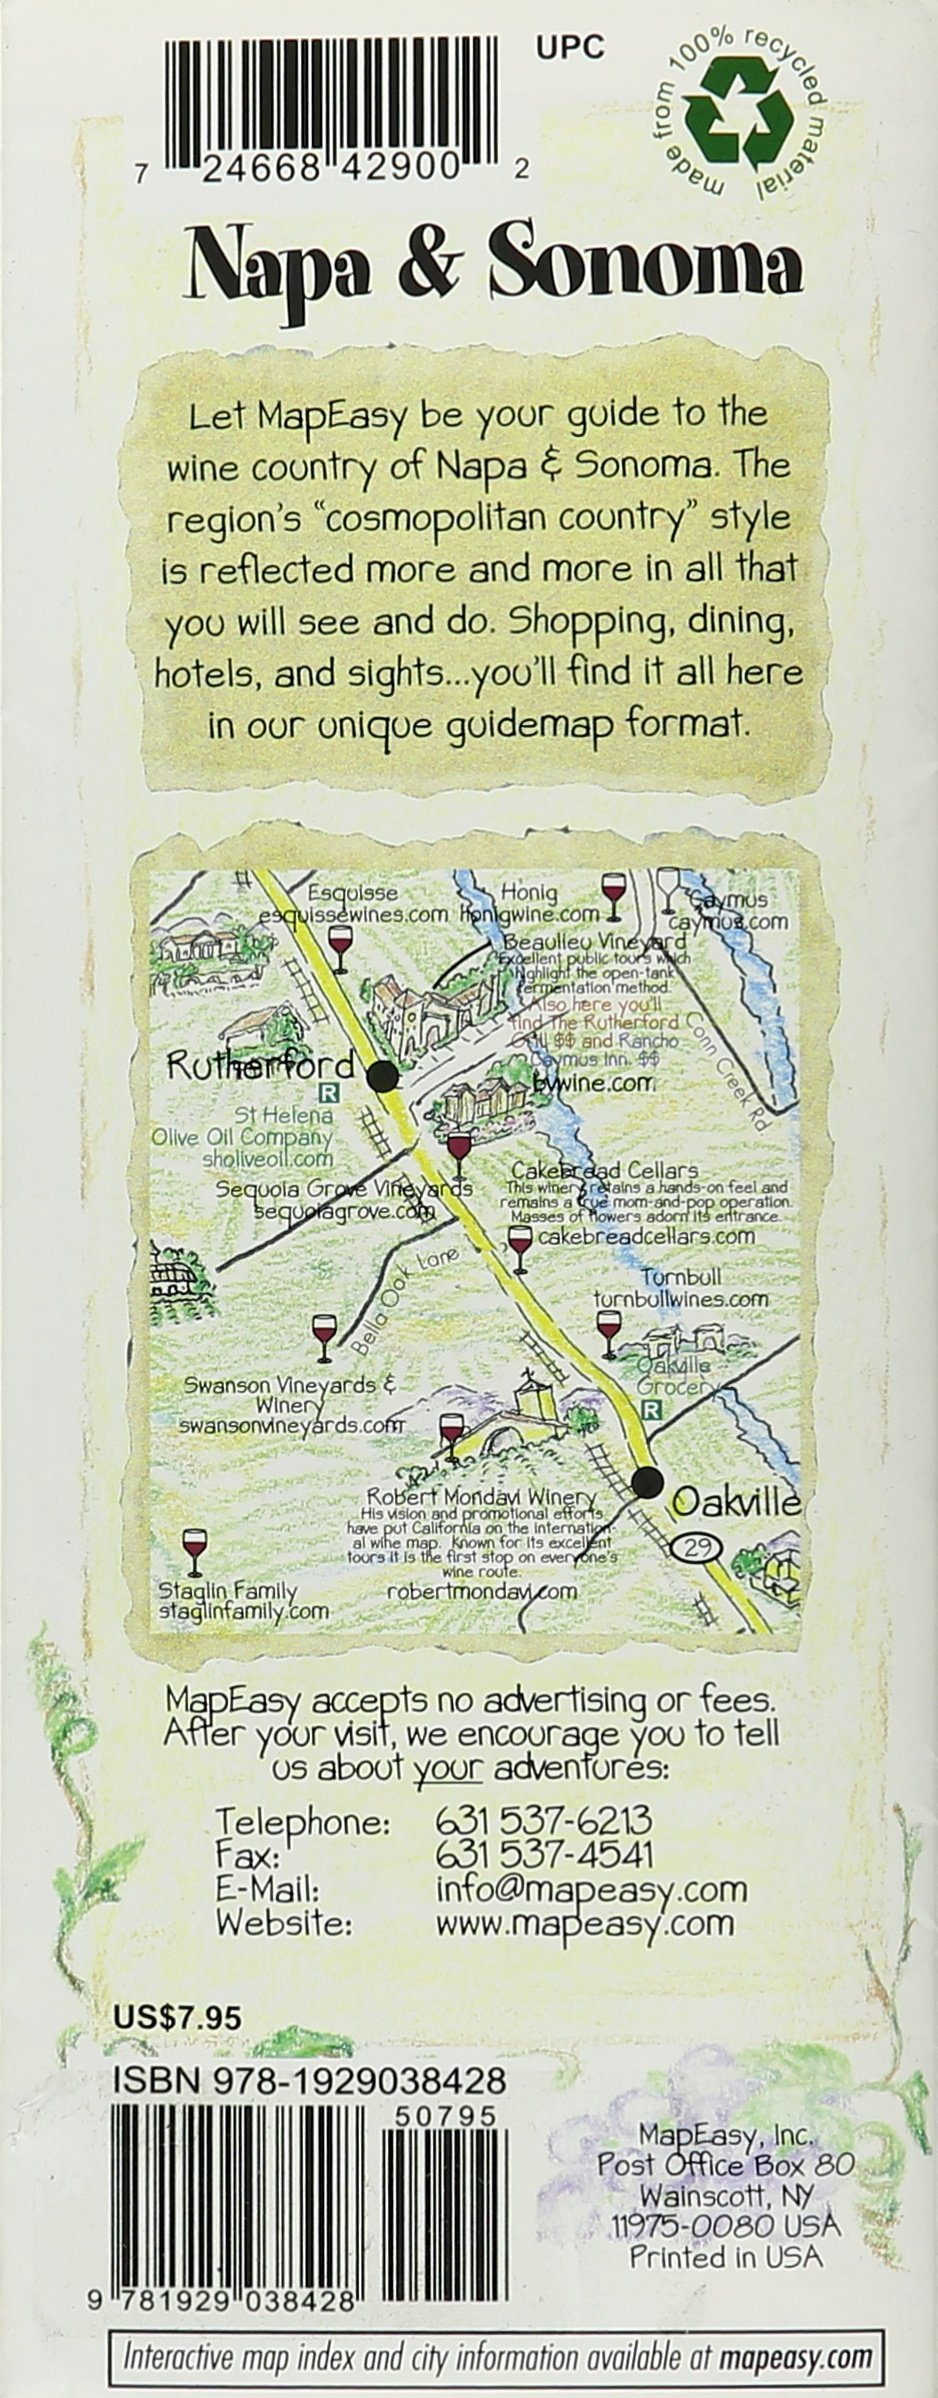 MapEasys Guidemap To NapaSonoma MapEasy Amazon - Map of napa hotels